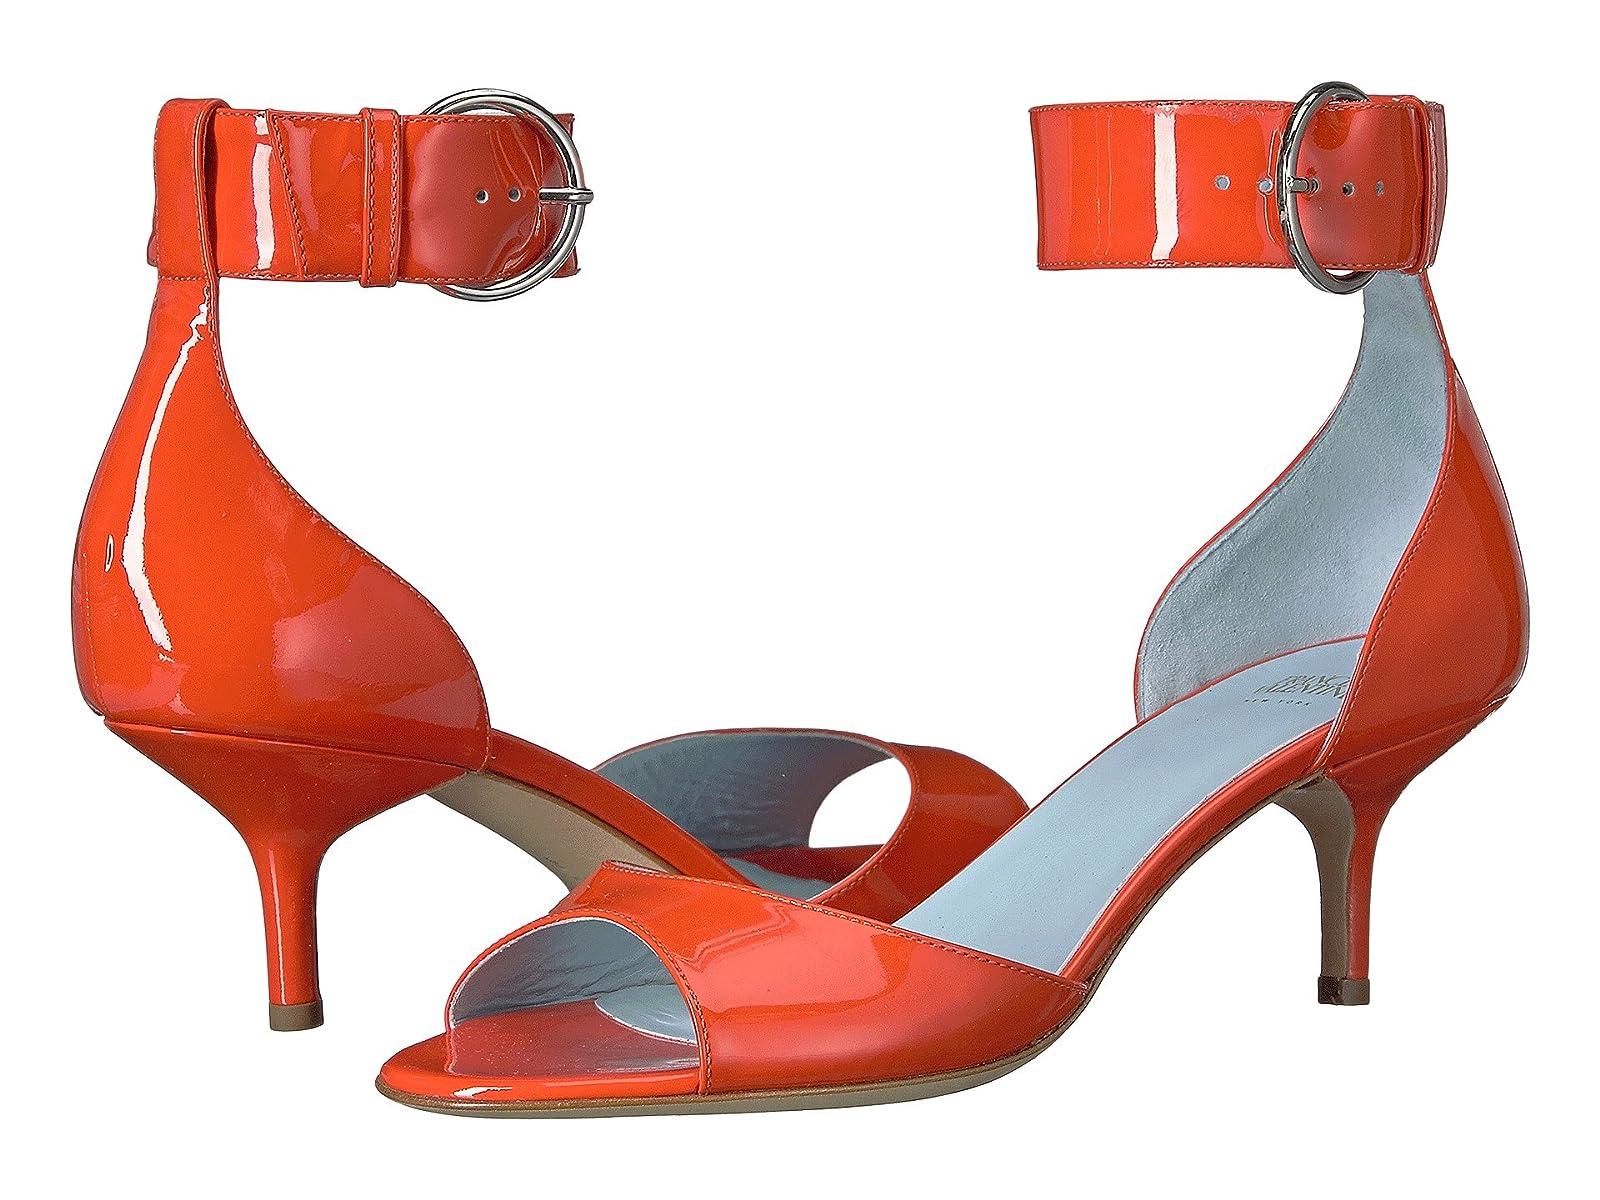 Frances Valentine LizzieCheap and distinctive eye-catching shoes